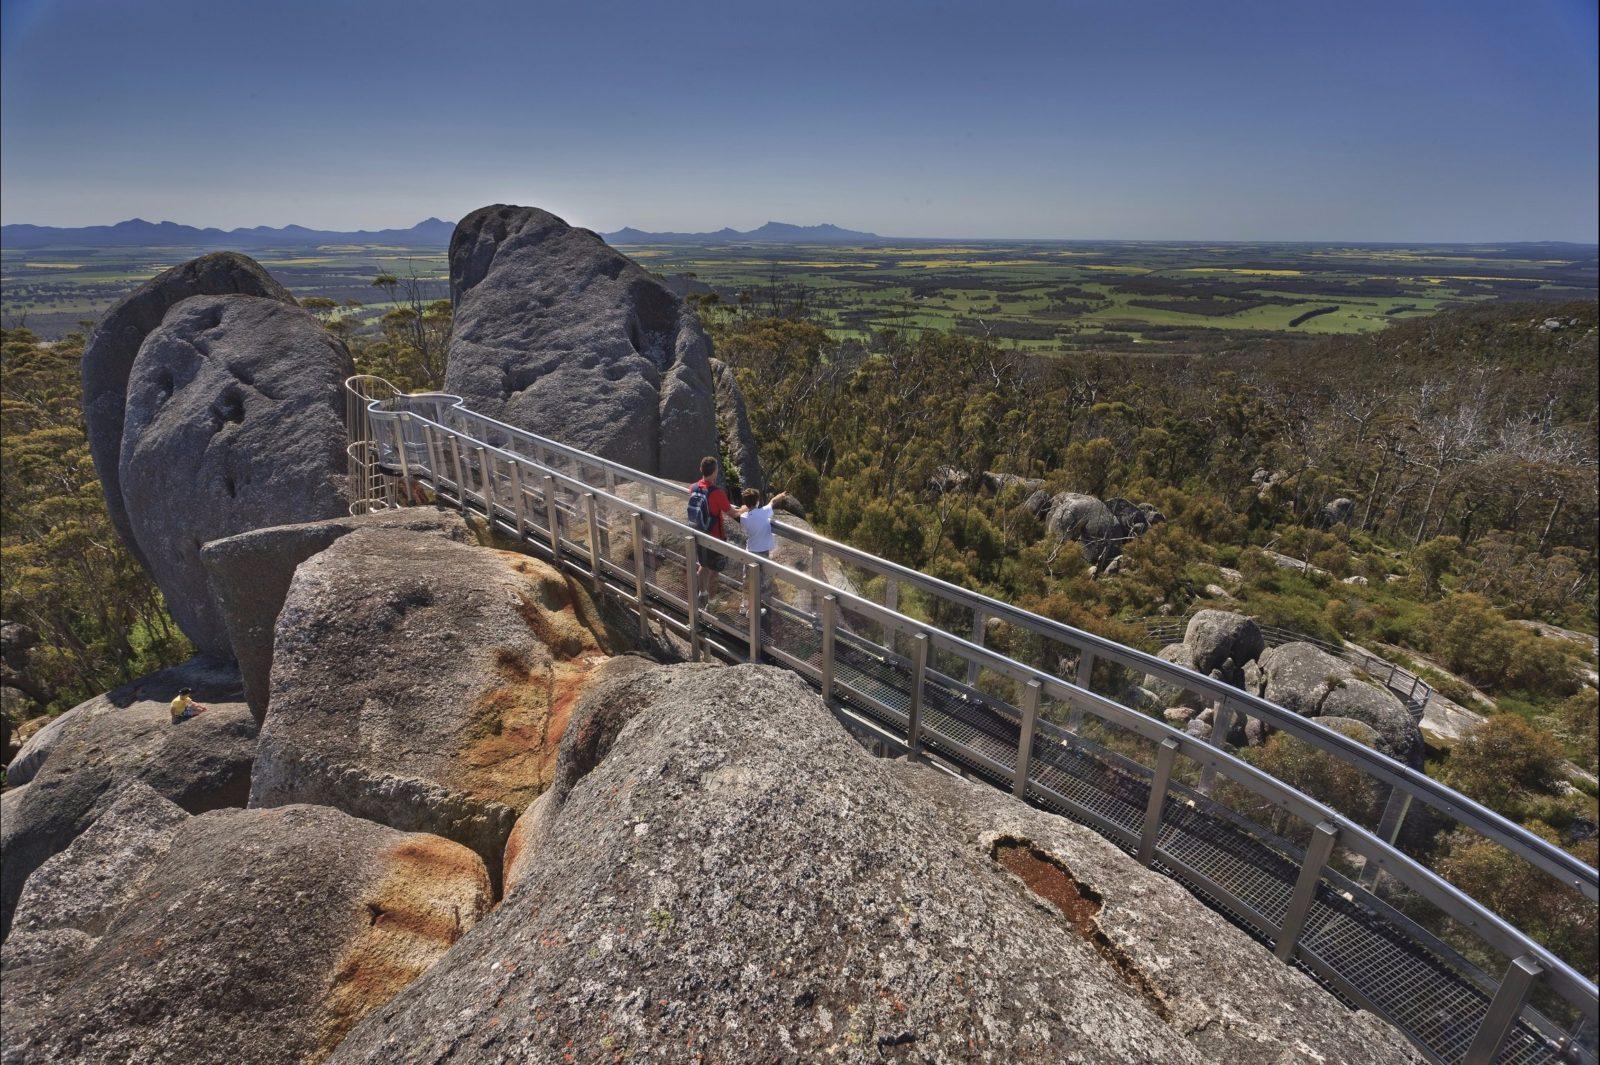 Granite Skywalk, Western Australia